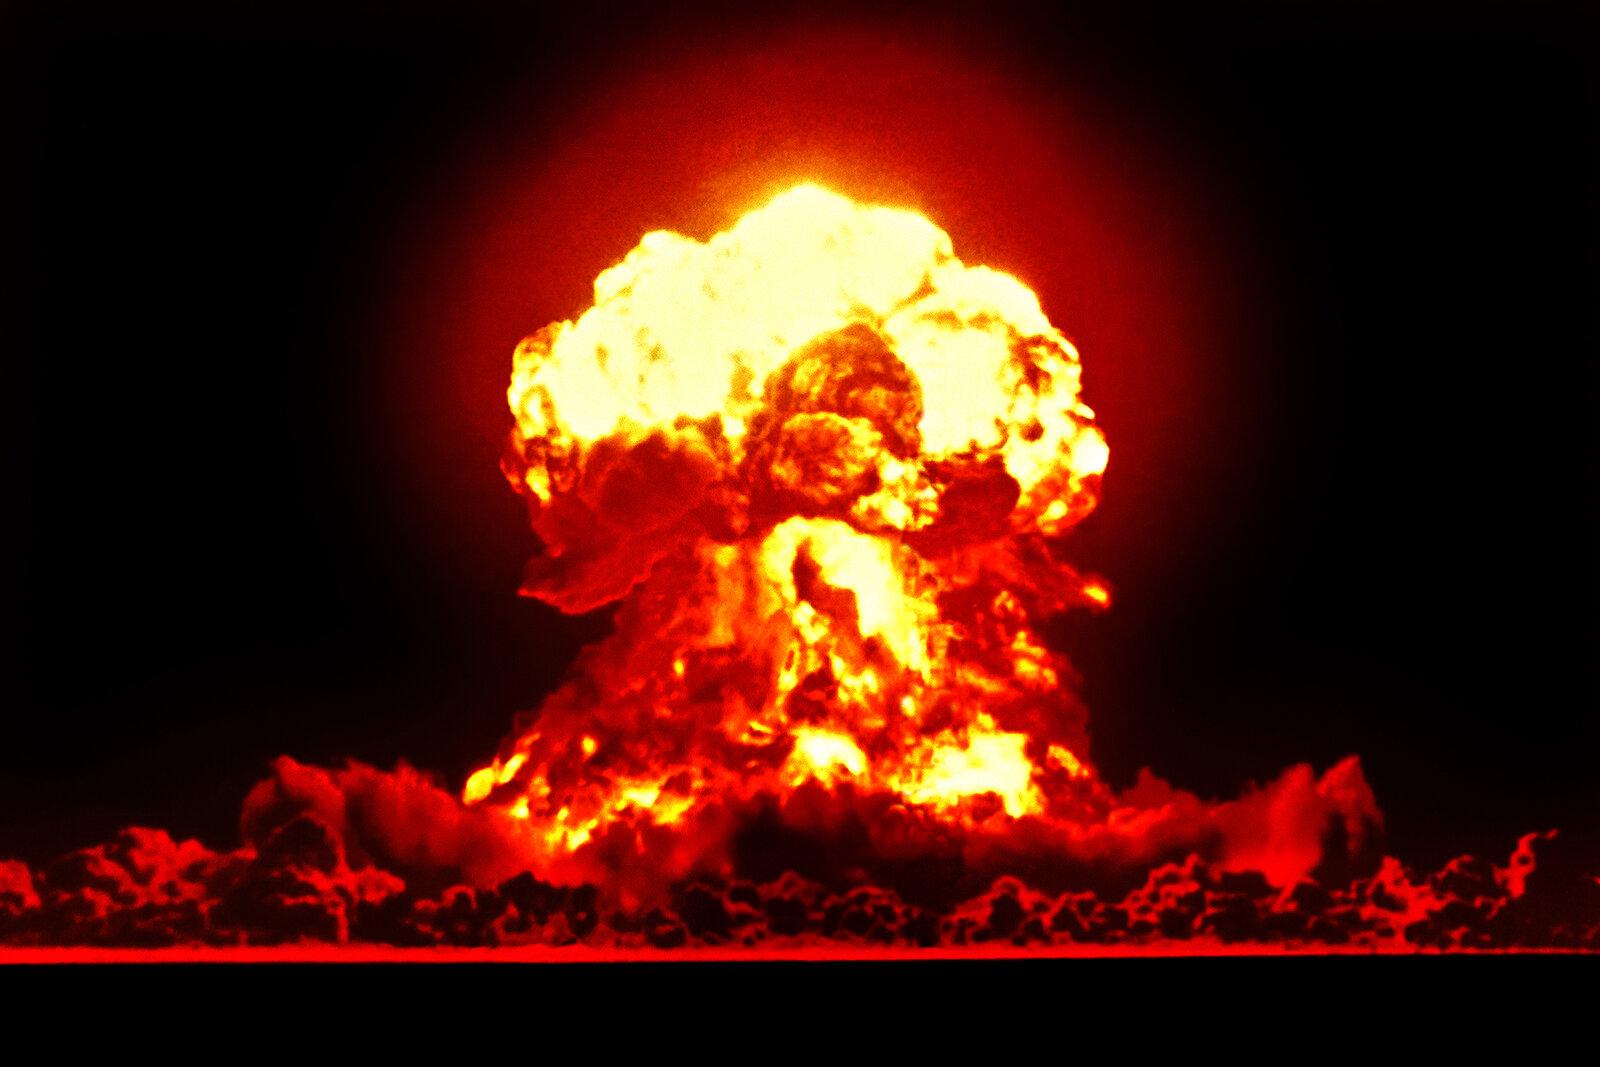 170821-nuclearexplosion-stock.jpg